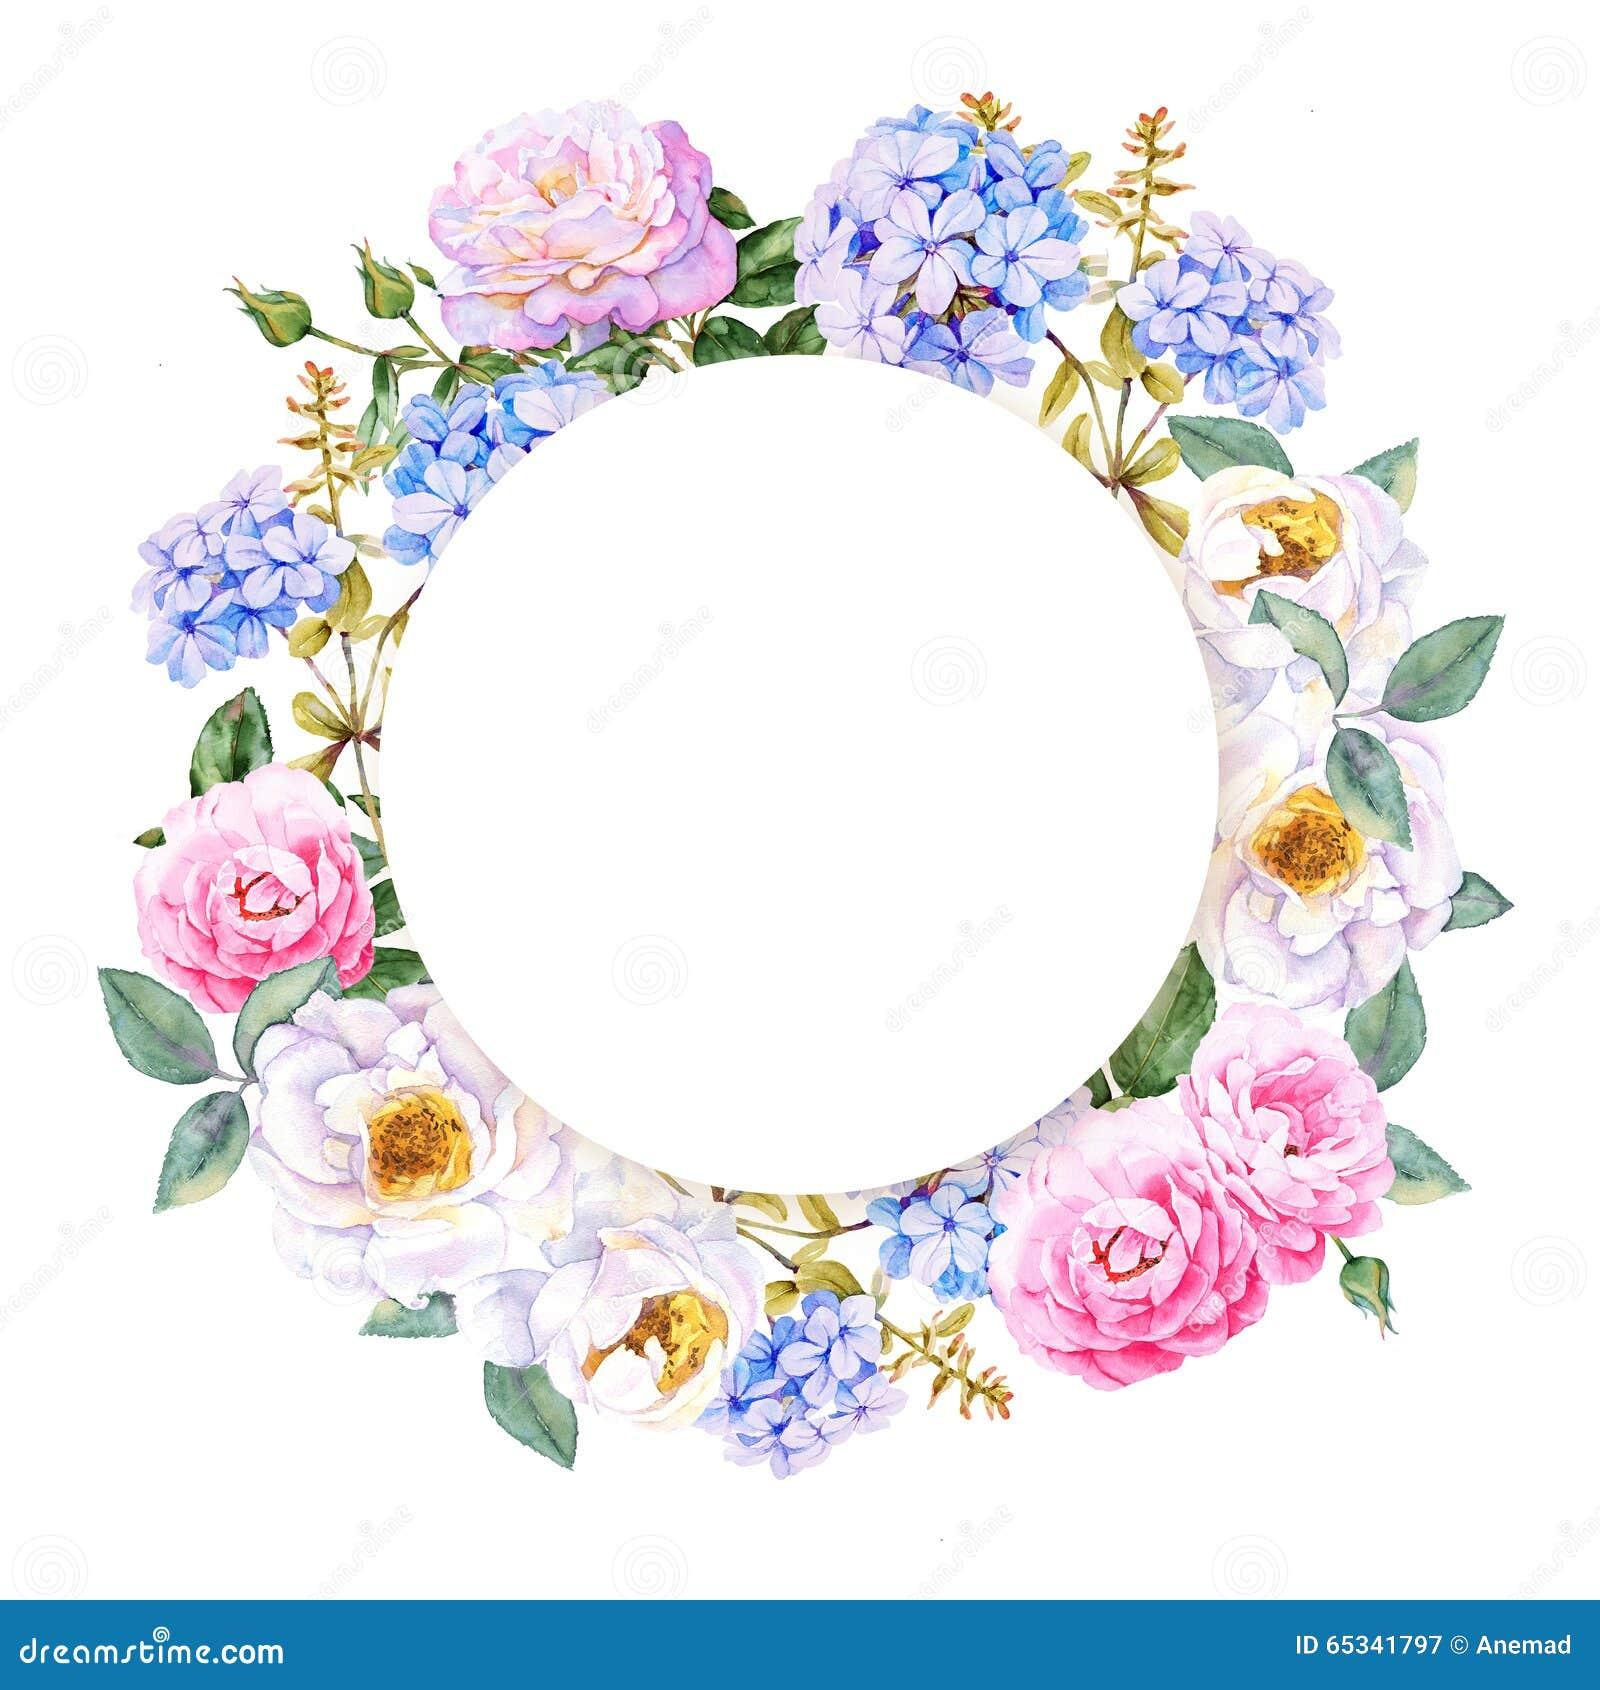 Flower Watercolor Spring Wreath